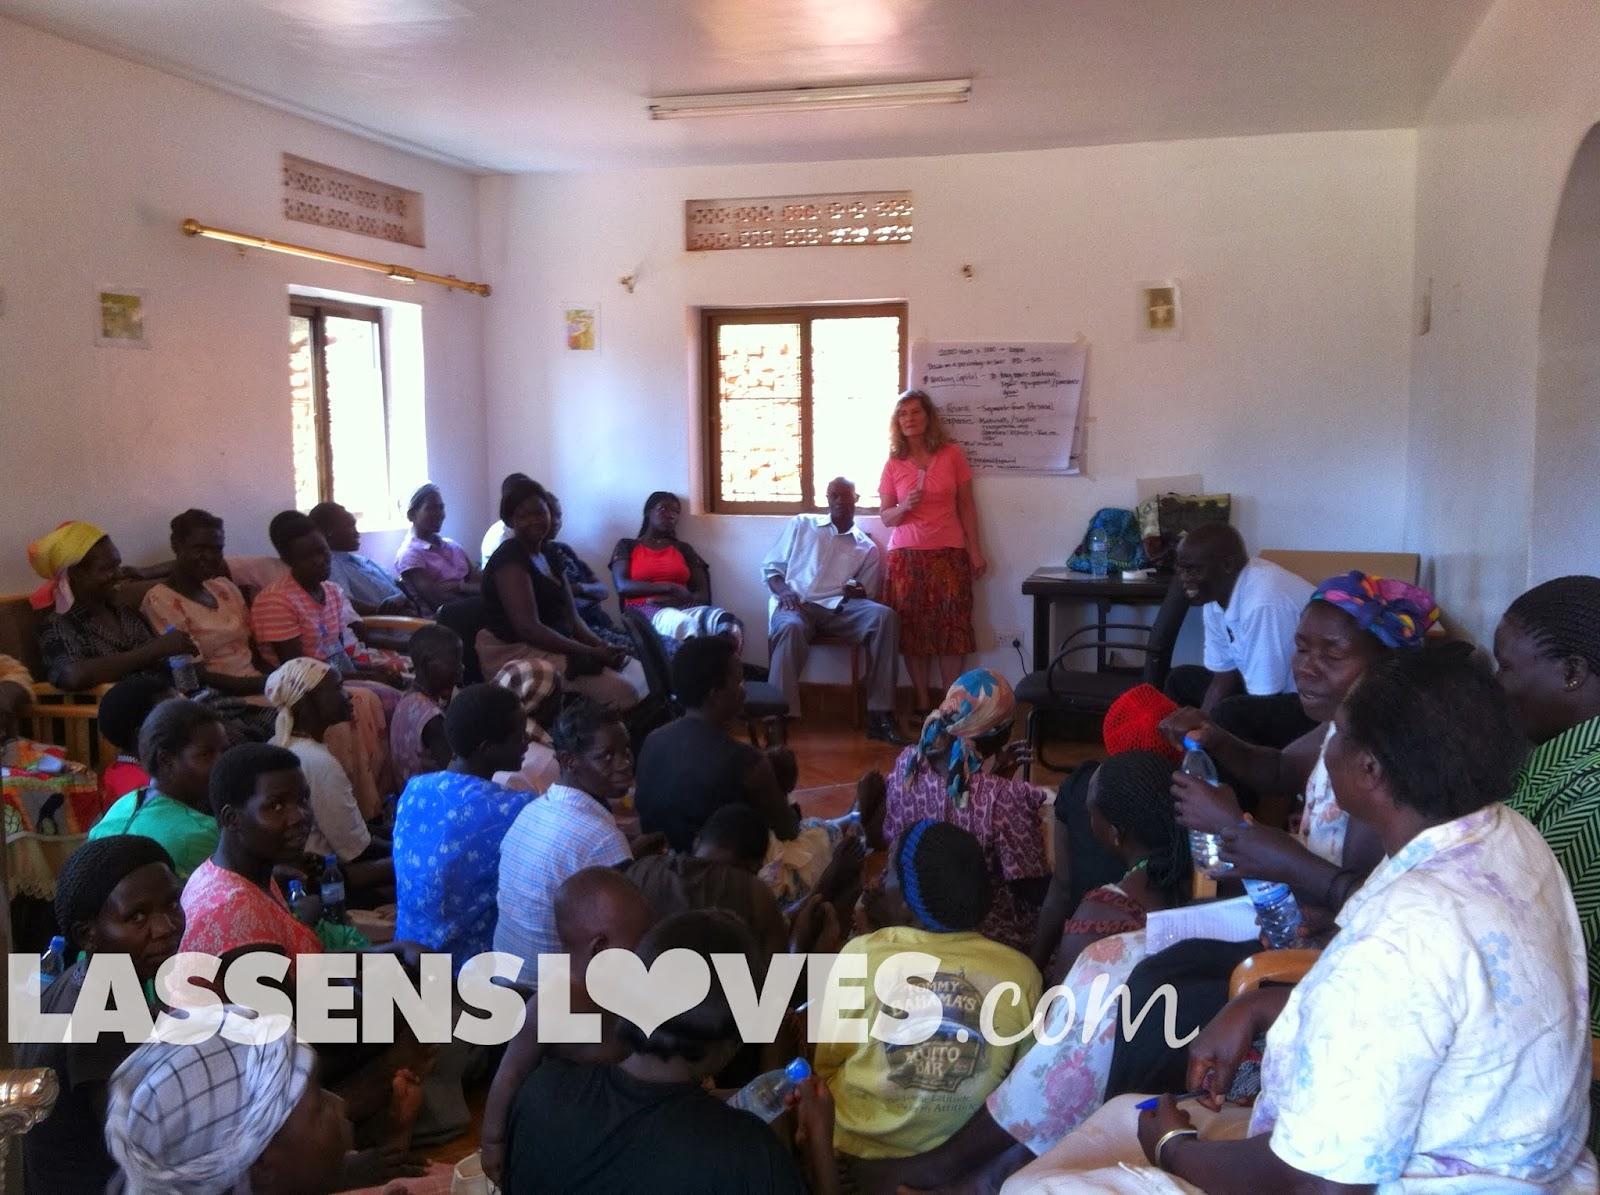 lassensloves.com, Lassen's, Gulu+Uganda, thrive+gulu, business+seminar